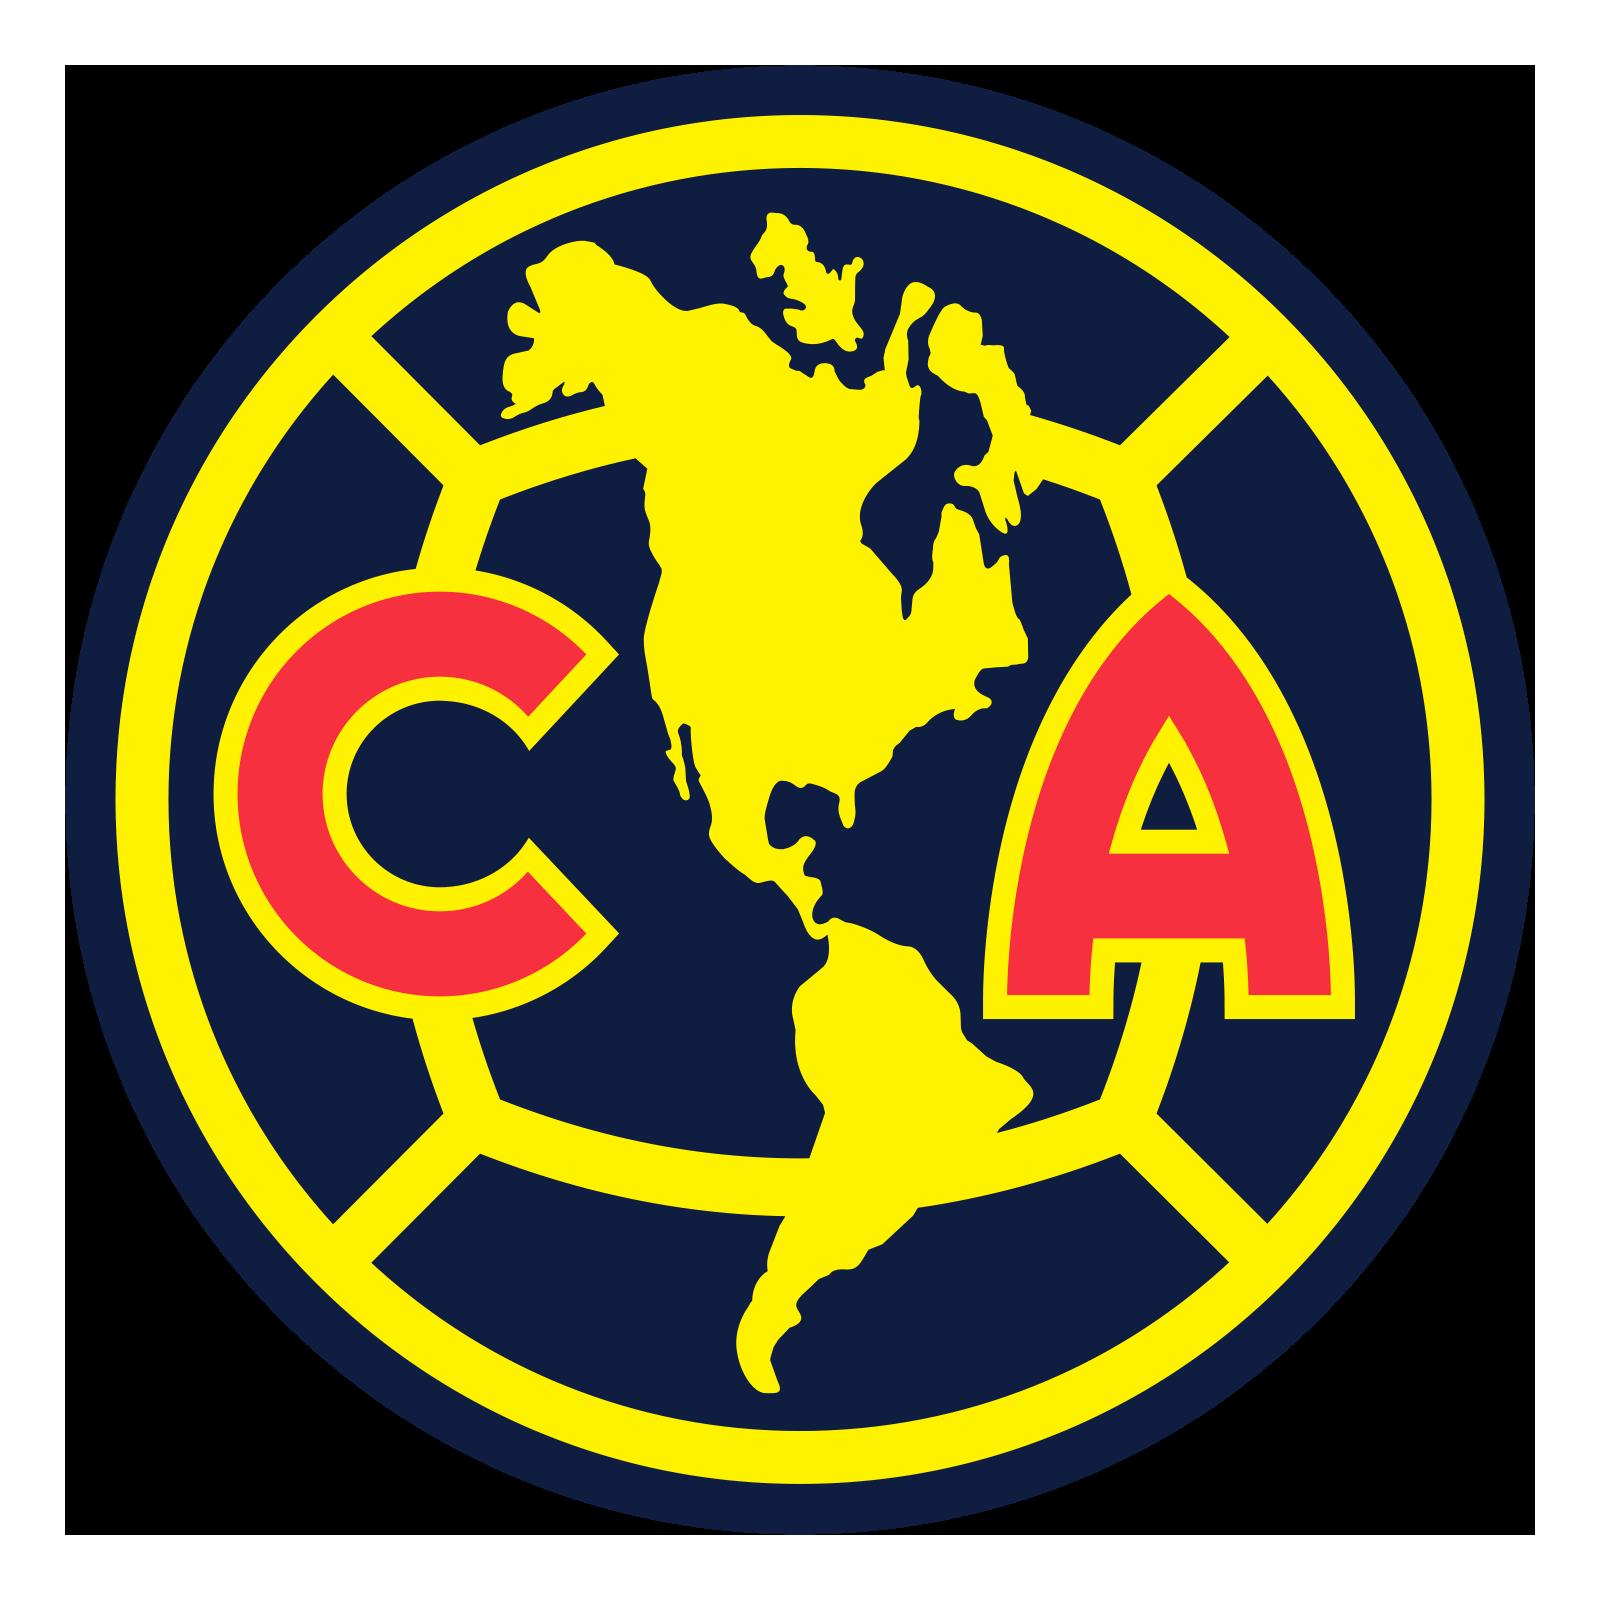 Club America Club America Soccer Club America Soccer Logo